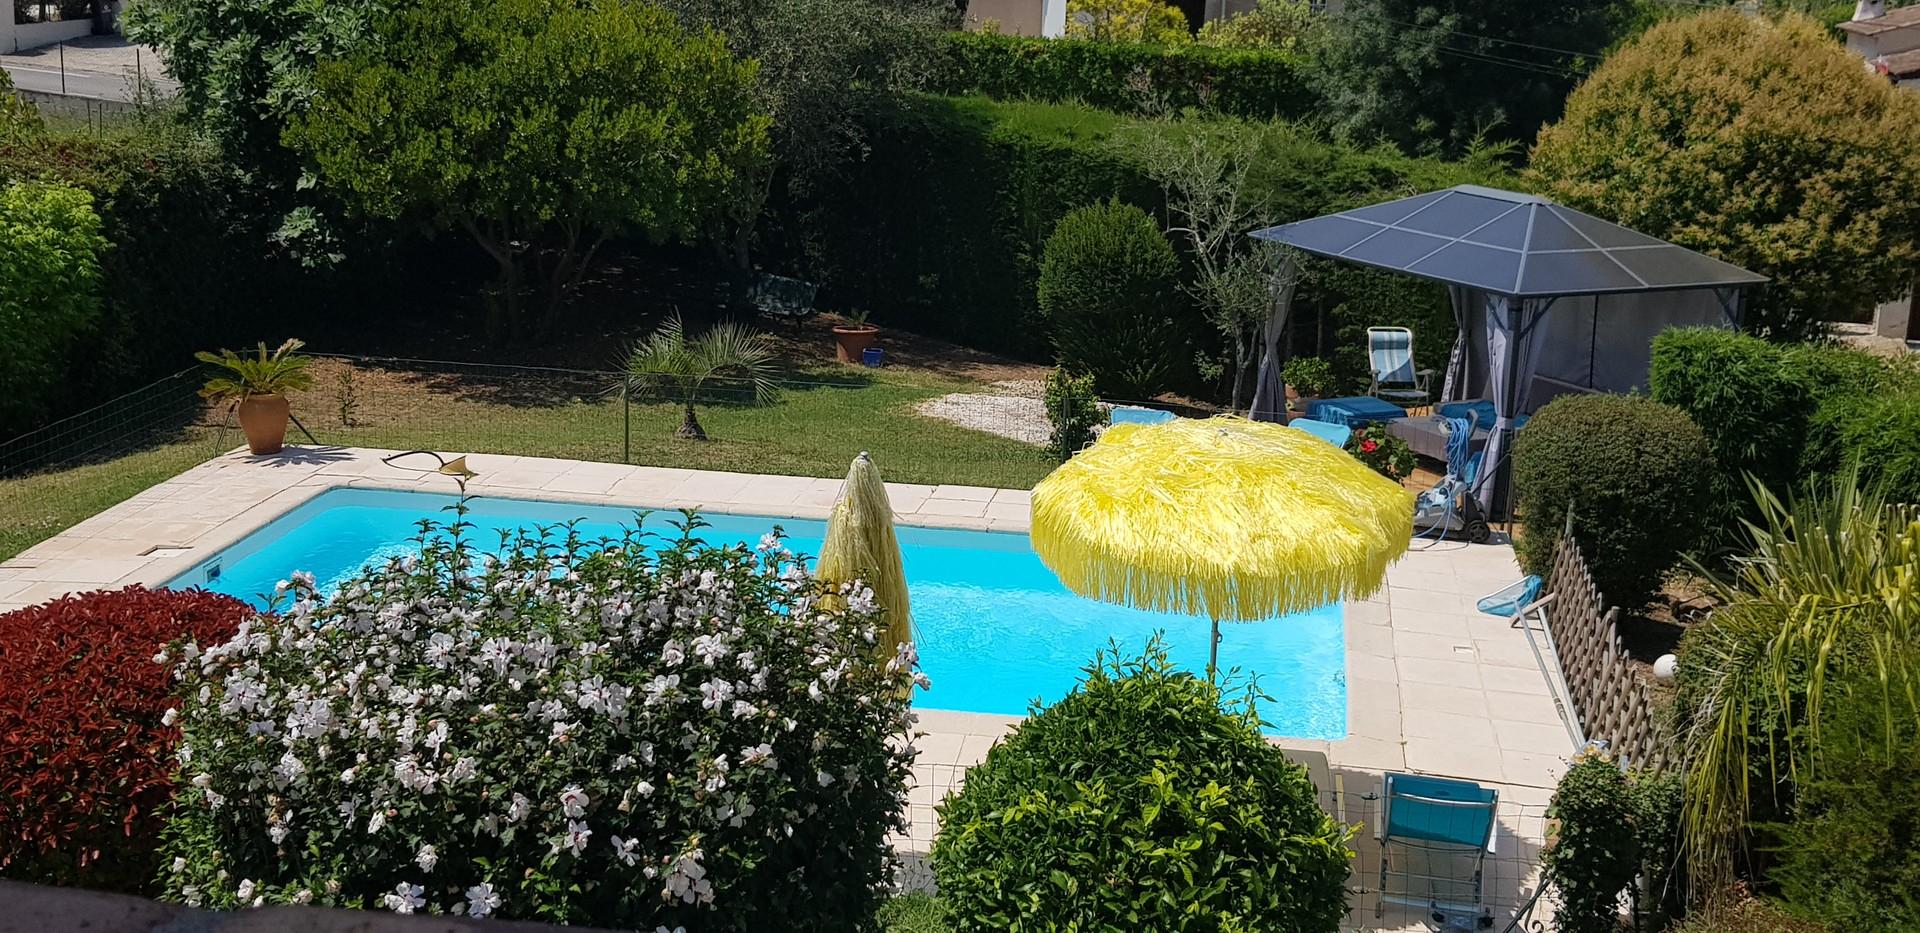 Grande Villa Standing Piscine Calme A Proximité De Sophia Antipolis pour Piscine A Proximité